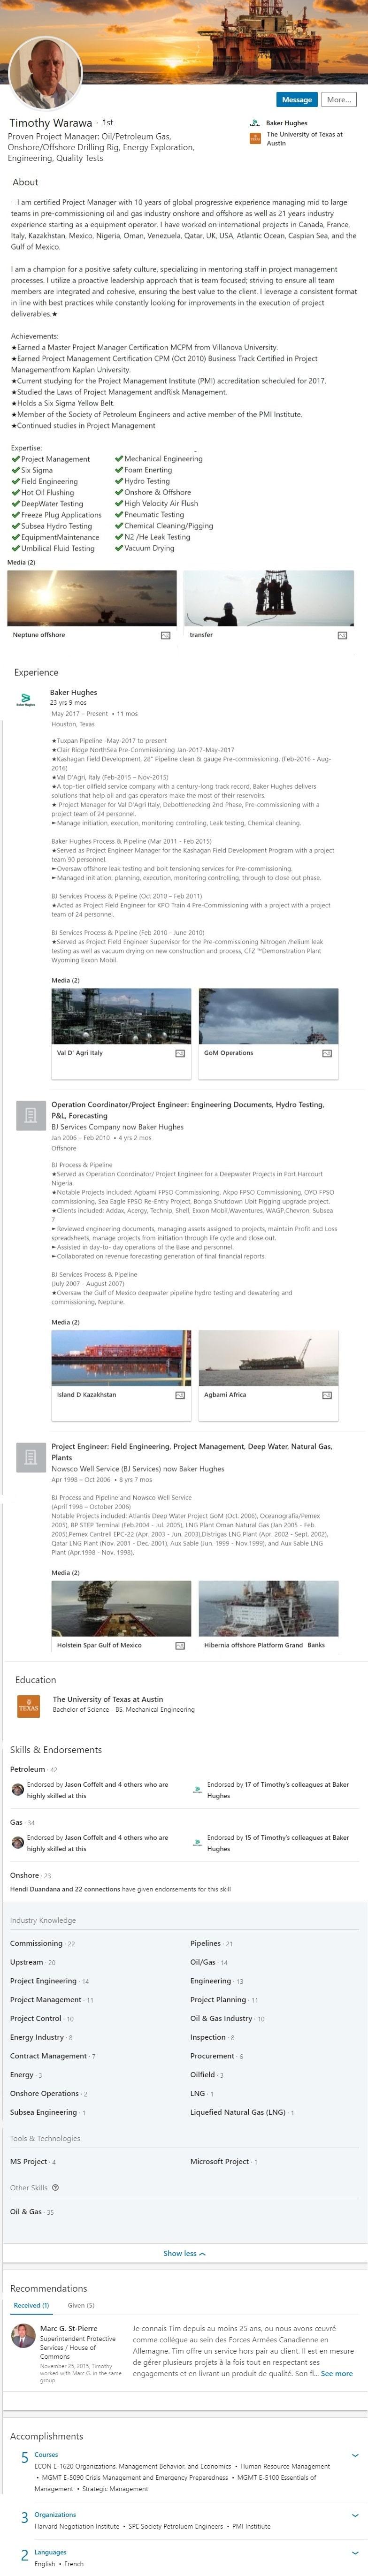 offshore oil energy drilling  LinkedIn Profile Example 1282